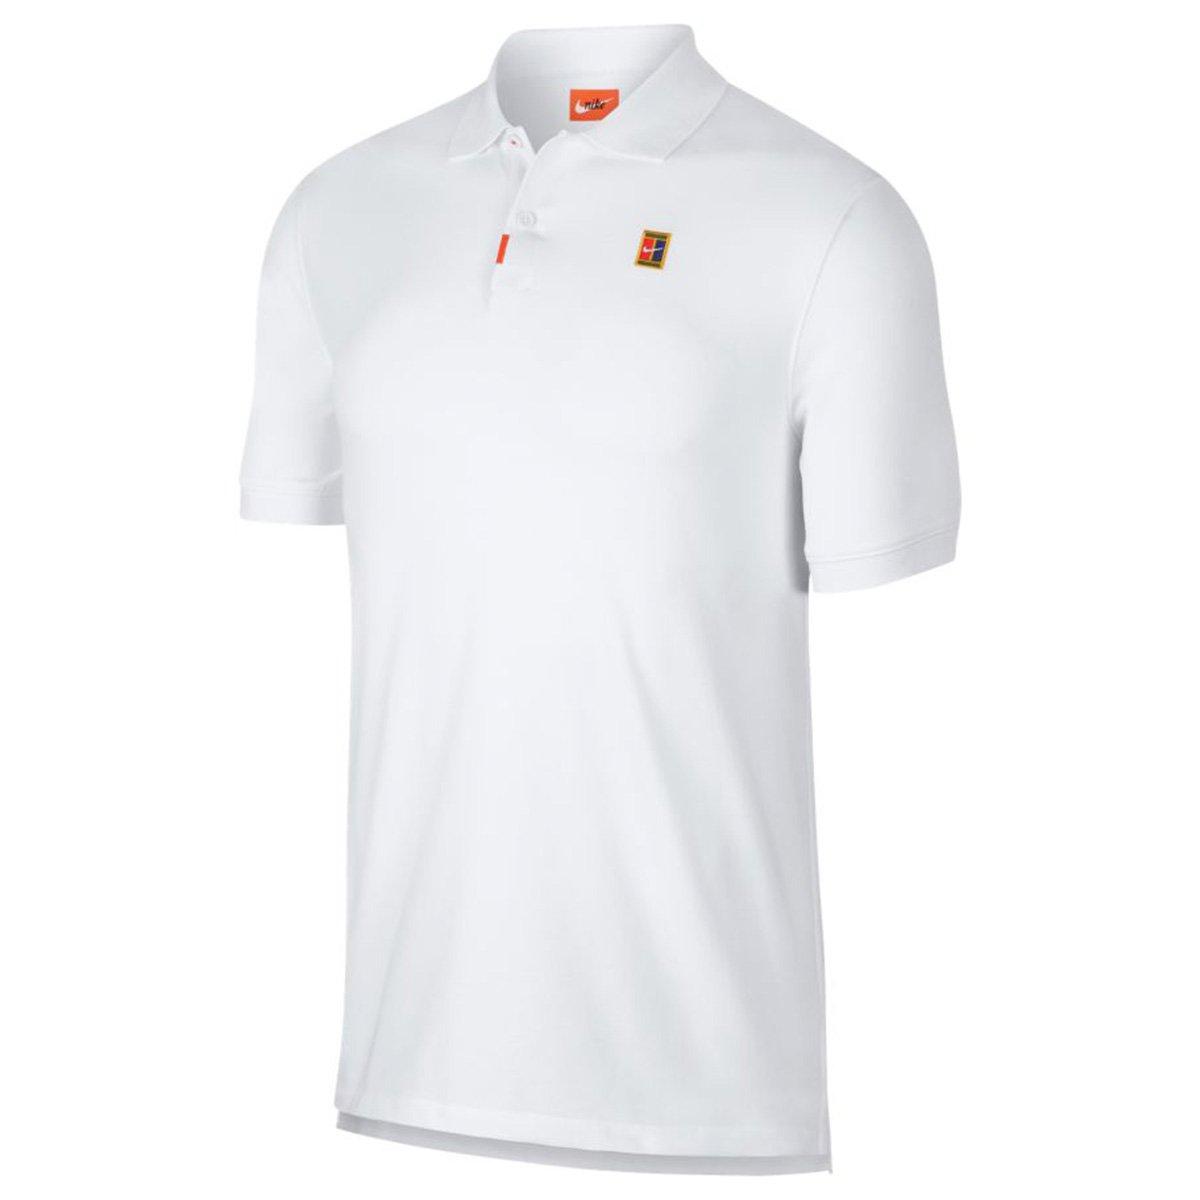 Camiseta Nike Masculina Court Tee Branca e Laranja tamanho:GG